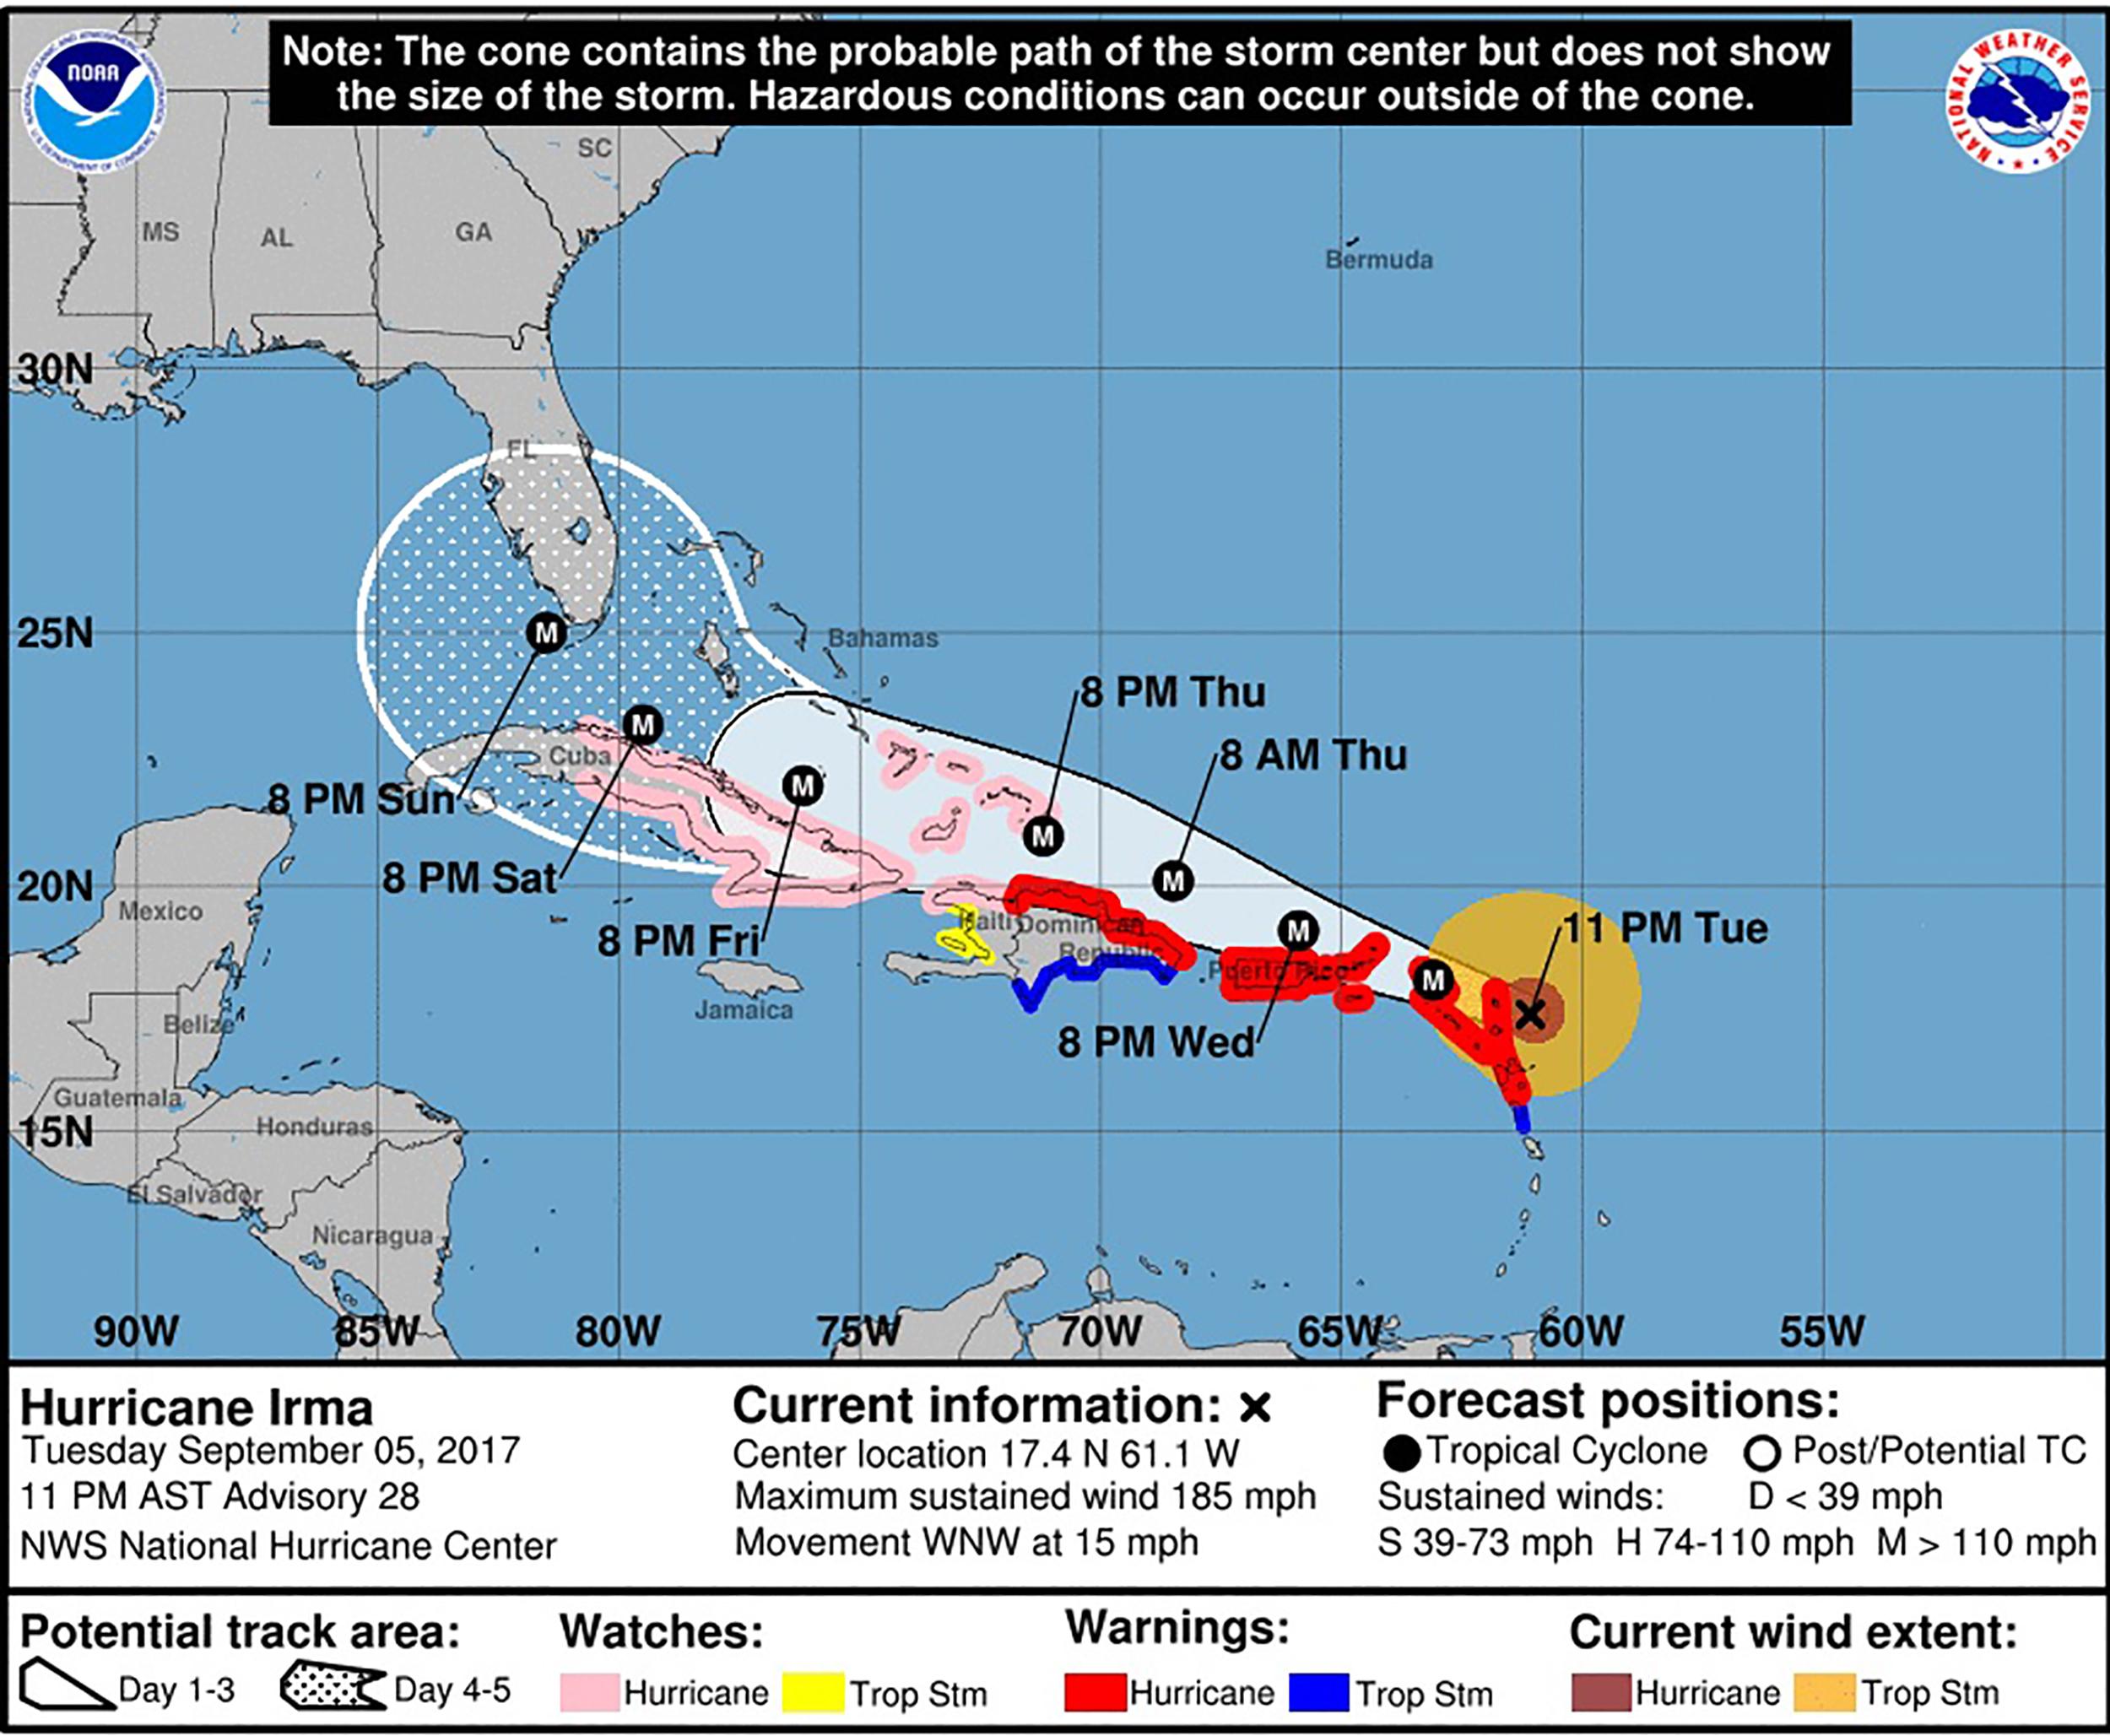 Image: Hurricane Irma projection